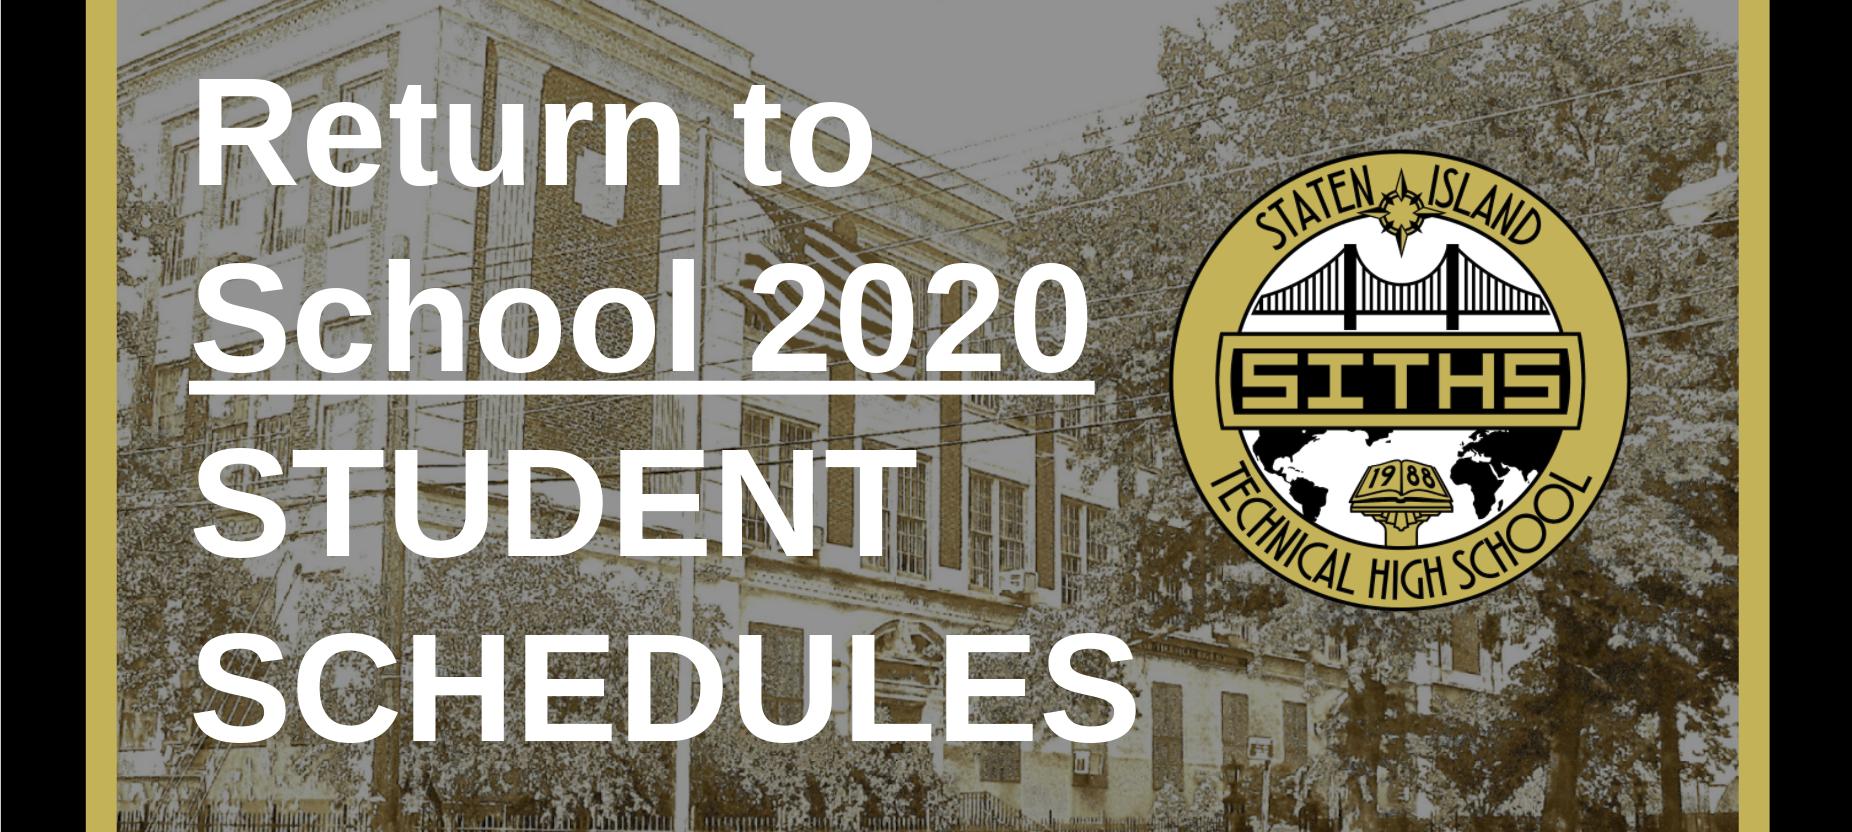 Student Schedules